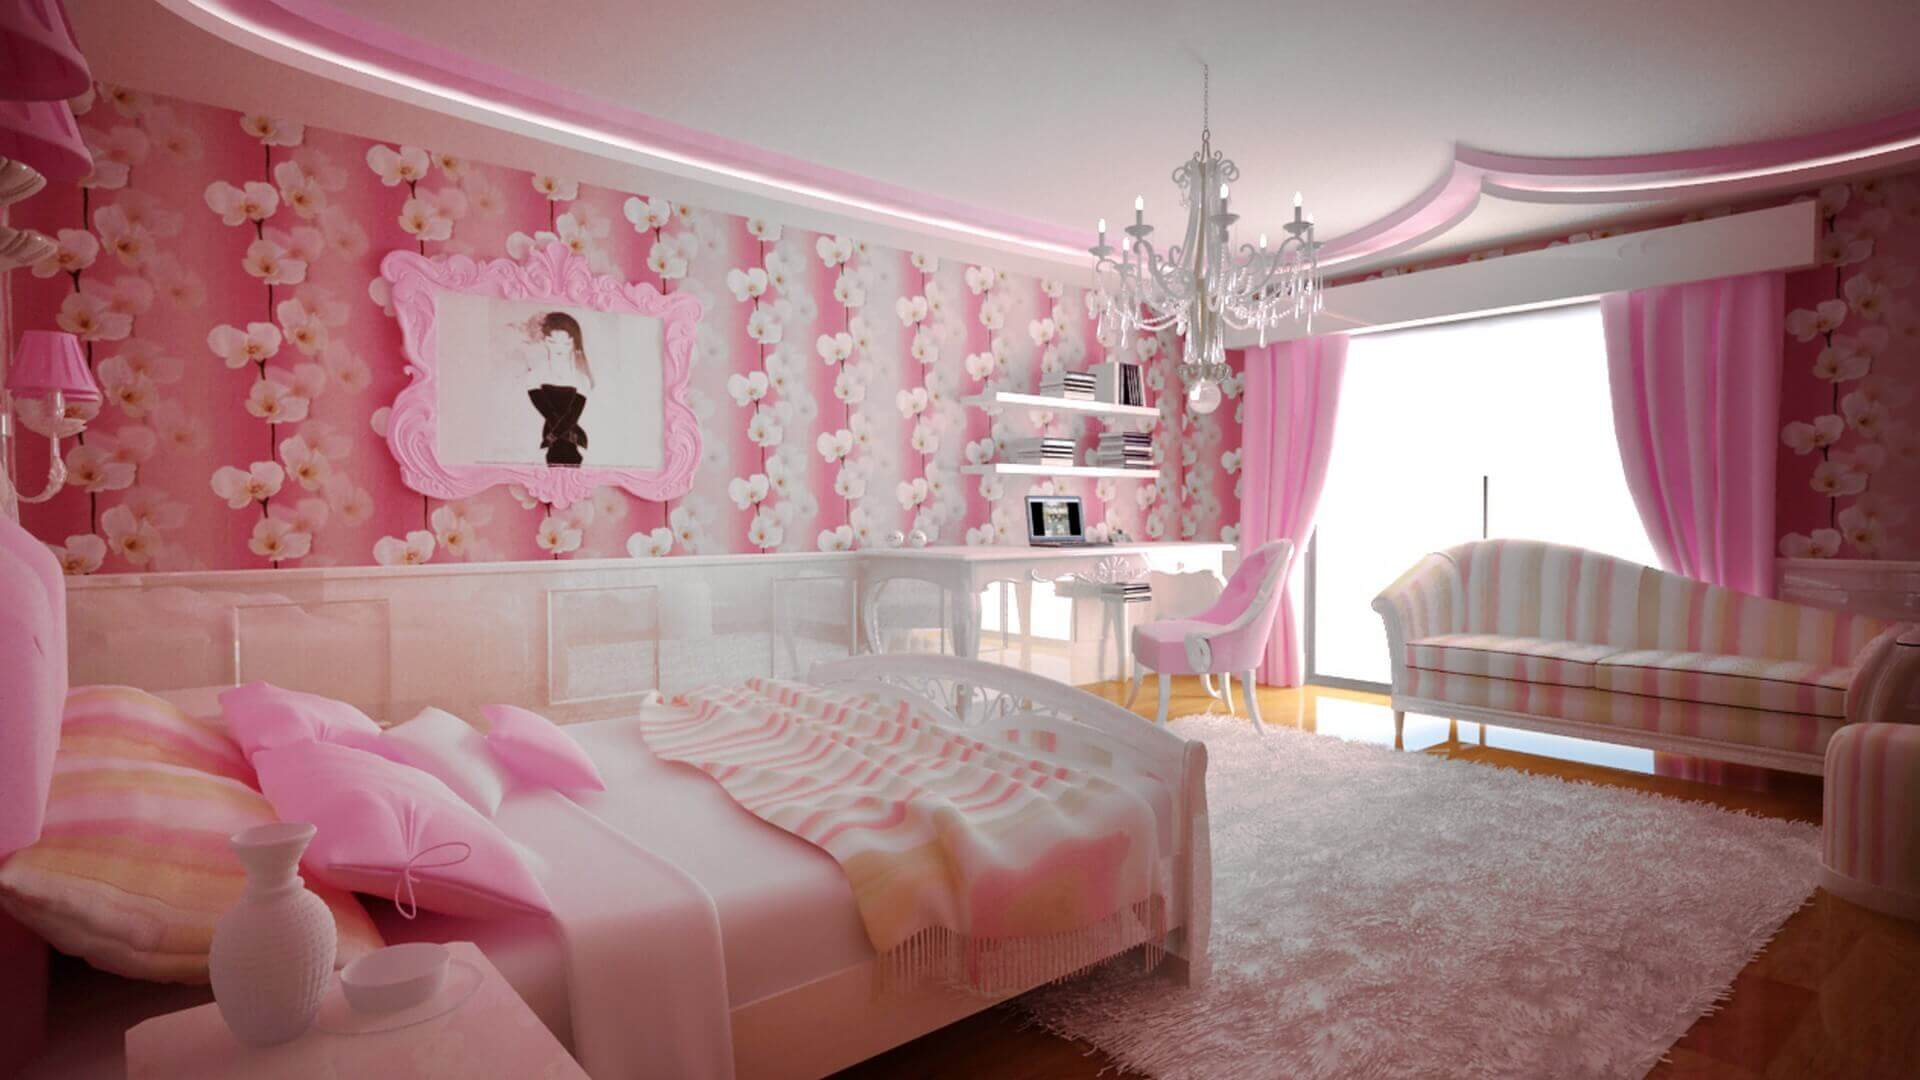 Home design 2921 C. Balta House Residential